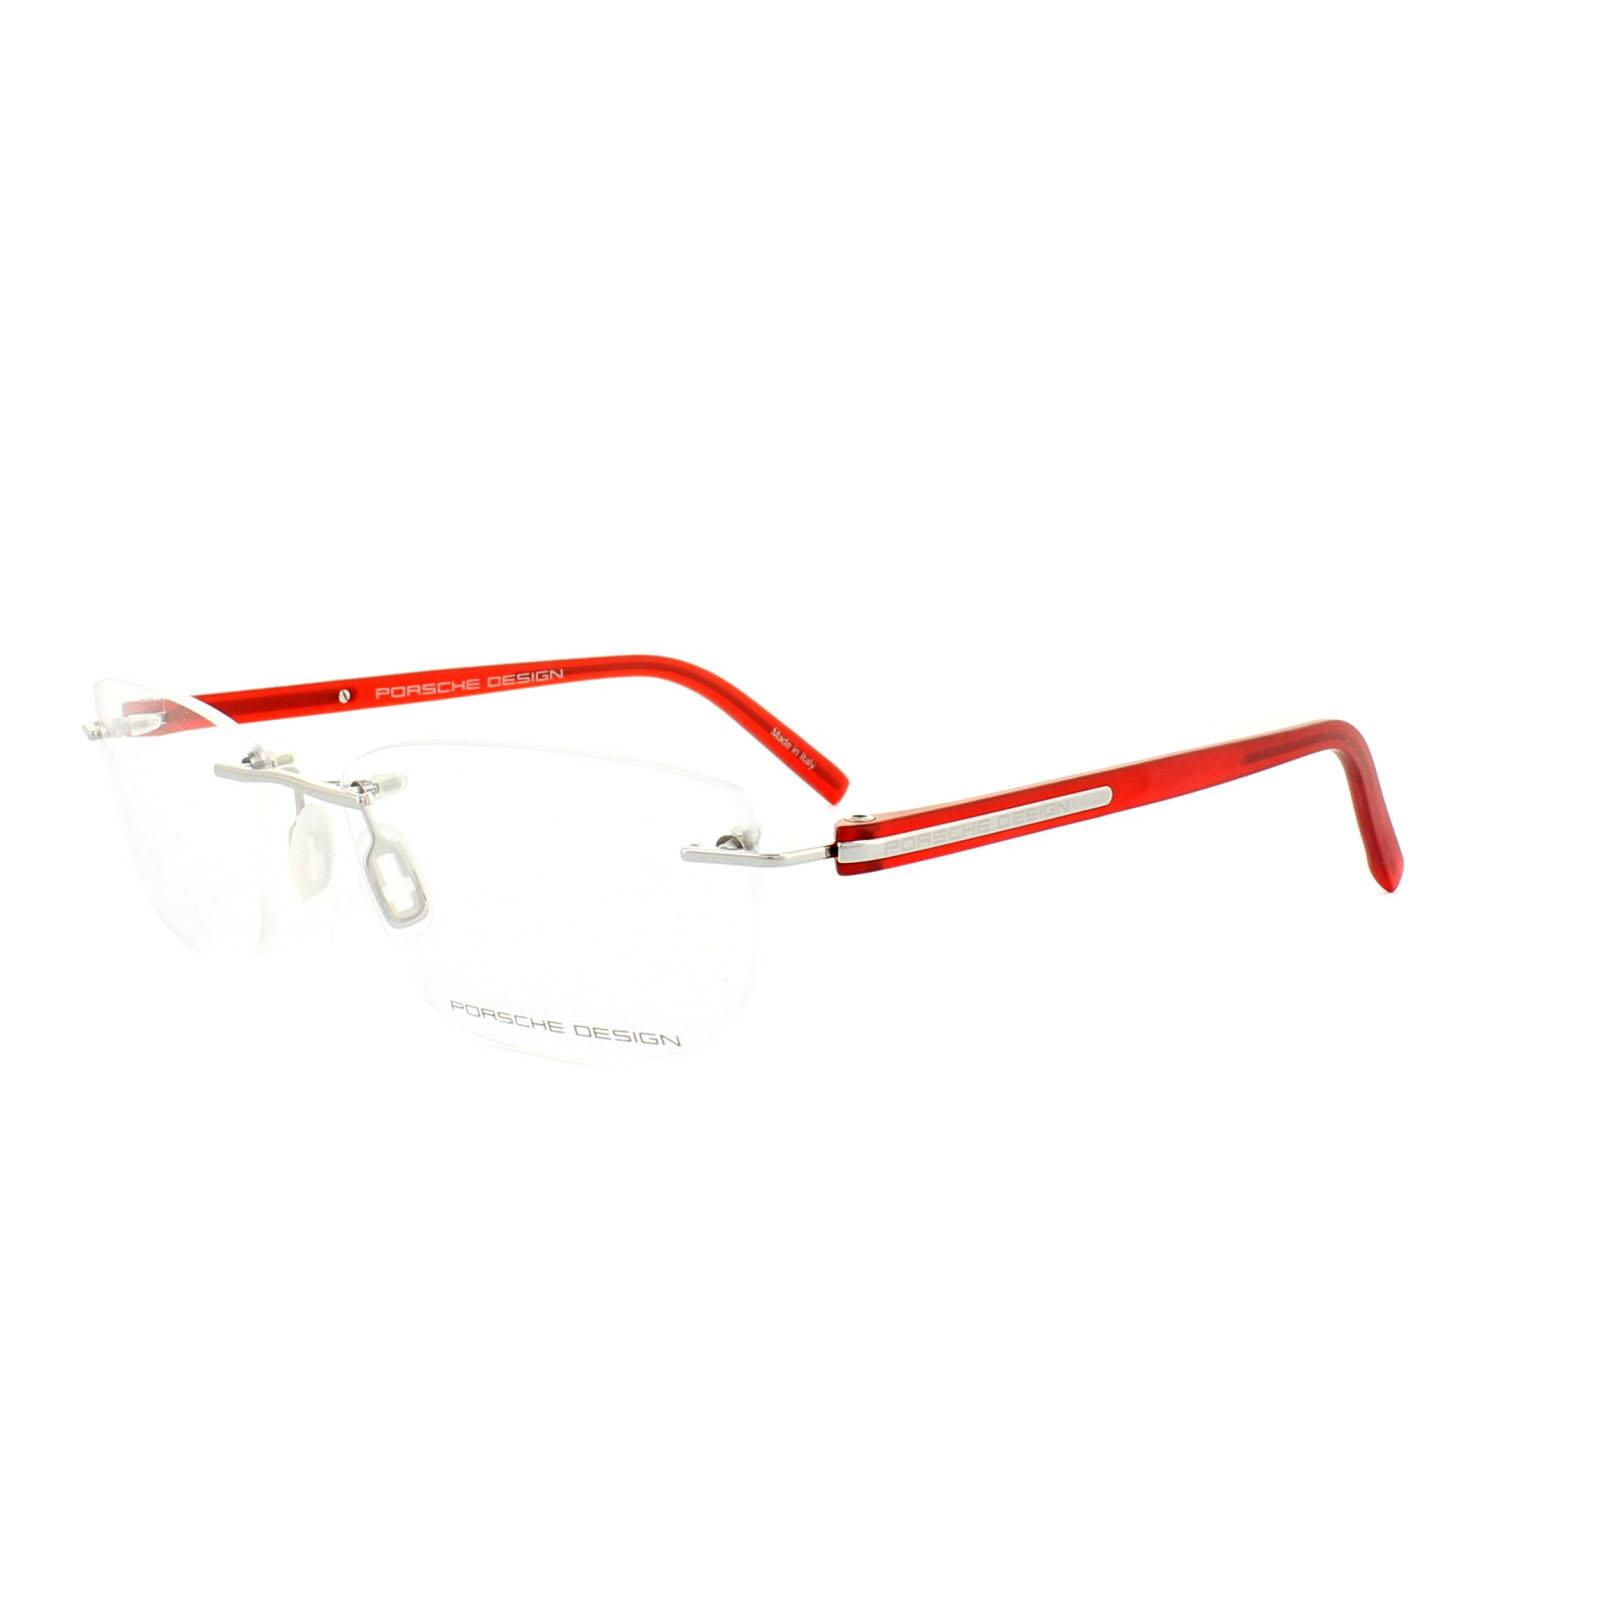 Porsche Design Glasses Frames P8245D D S1 Palladium & Red ...